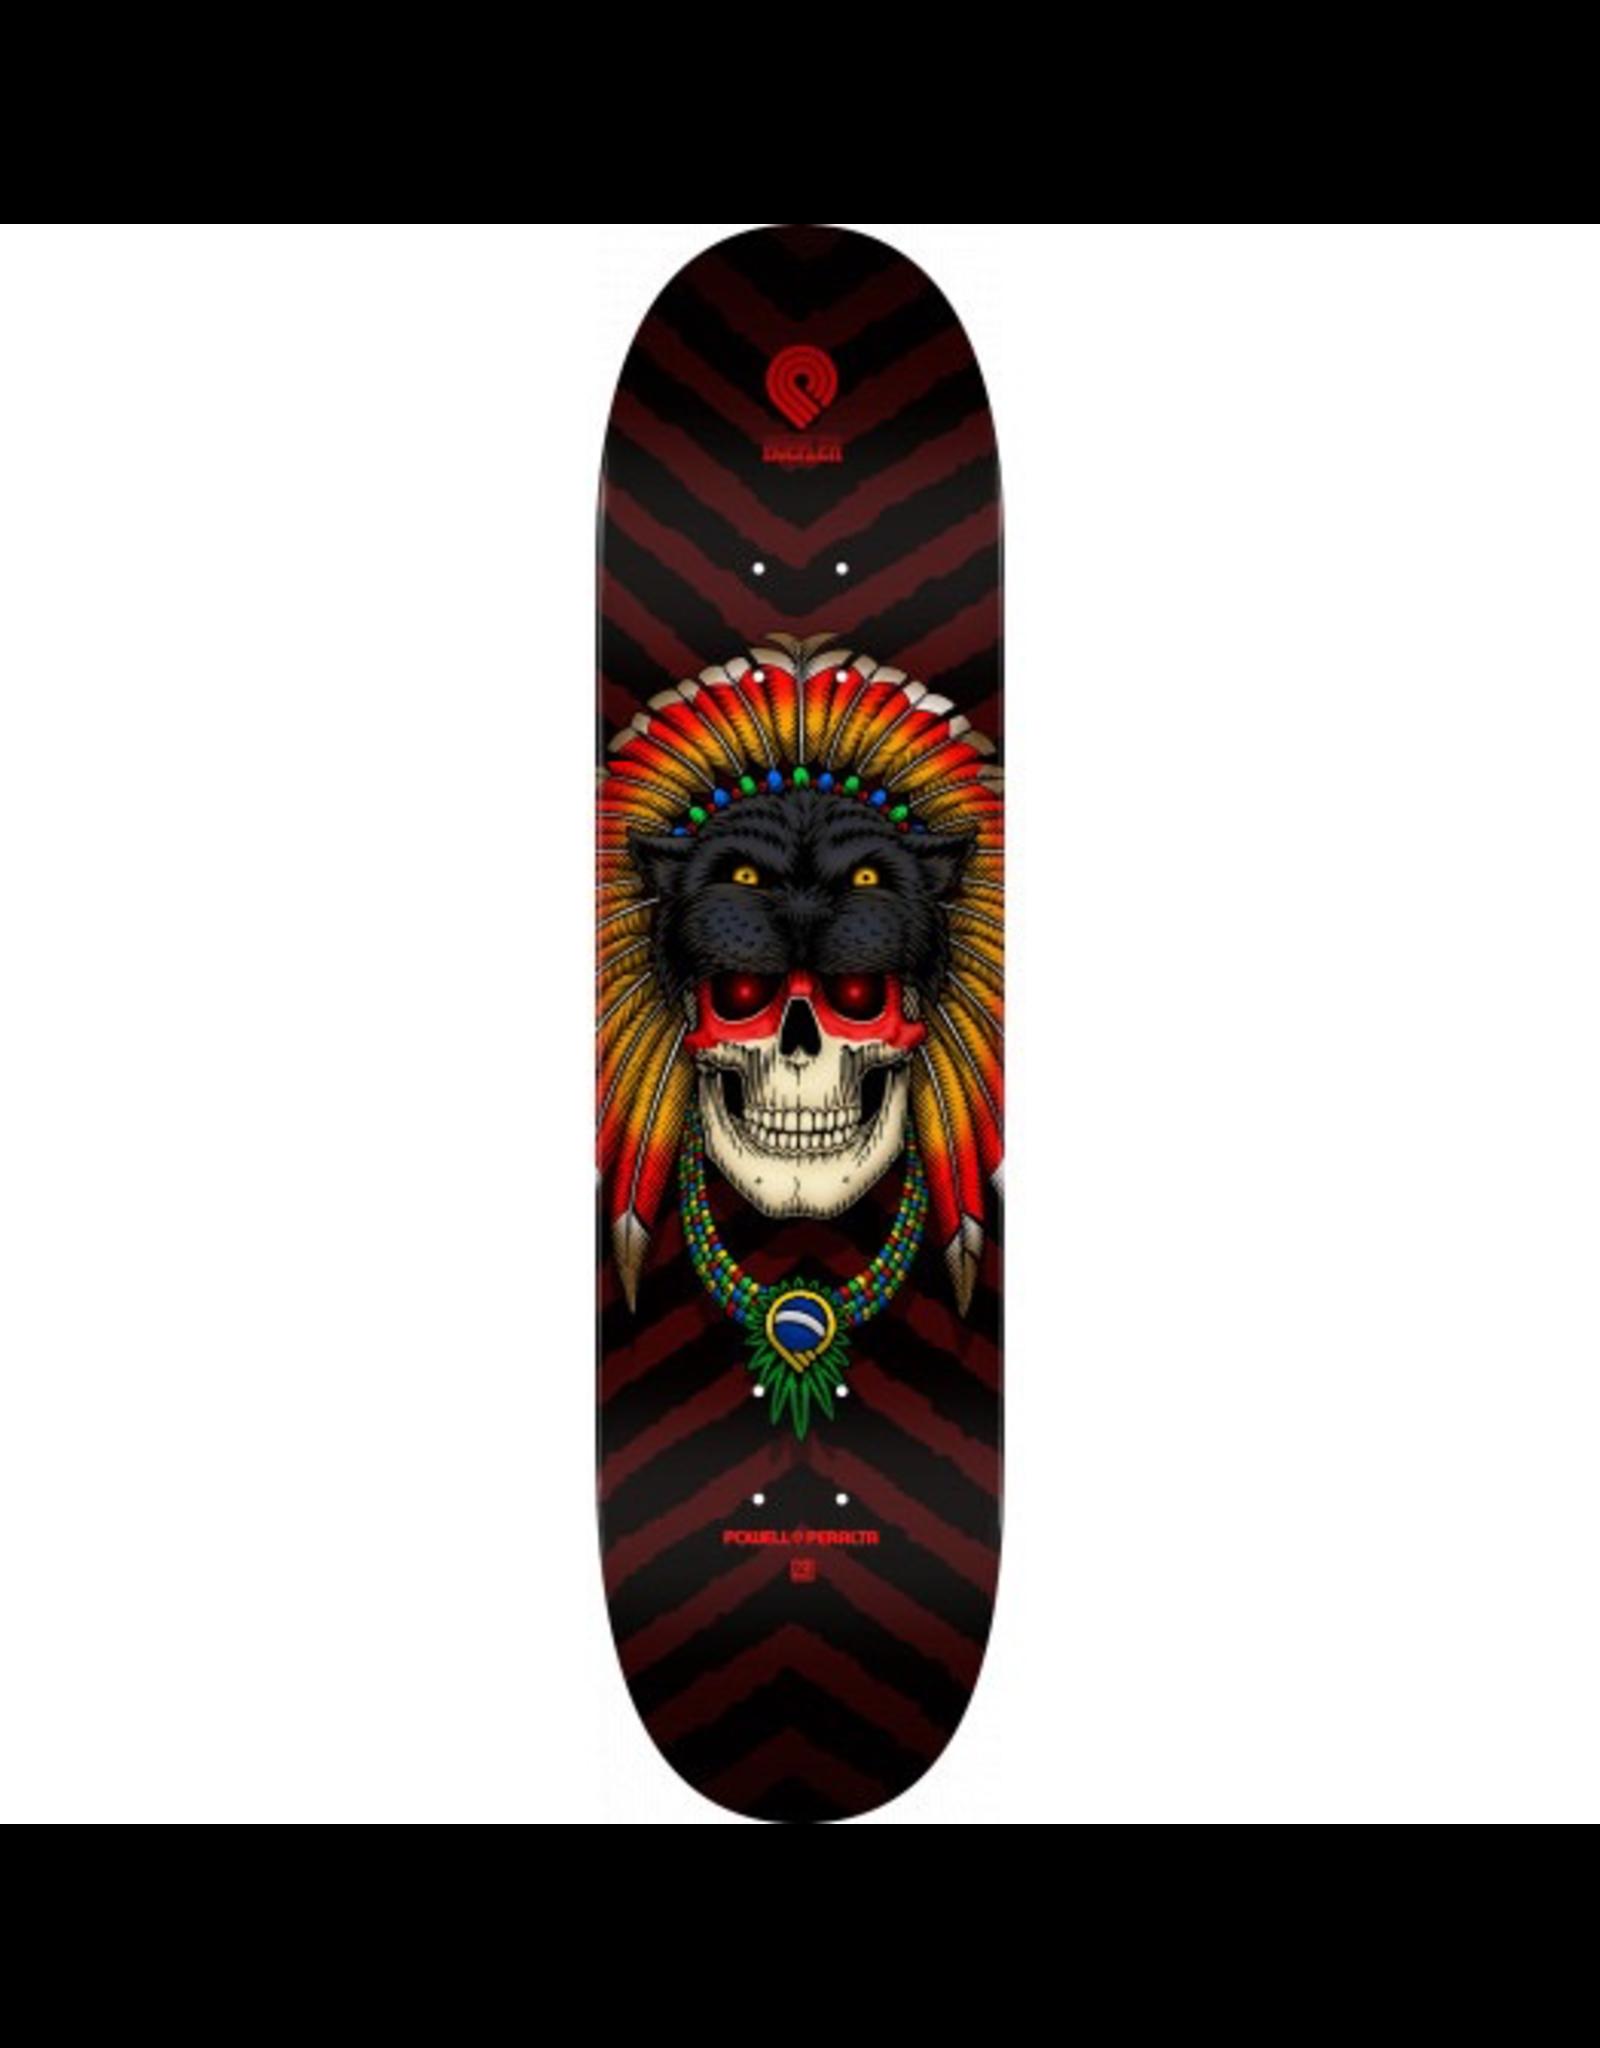 POWELL Powell Peralta Pro Kelvin Hoefler Skull Skateboard Deck - Shape 247 - 8 x 31.45